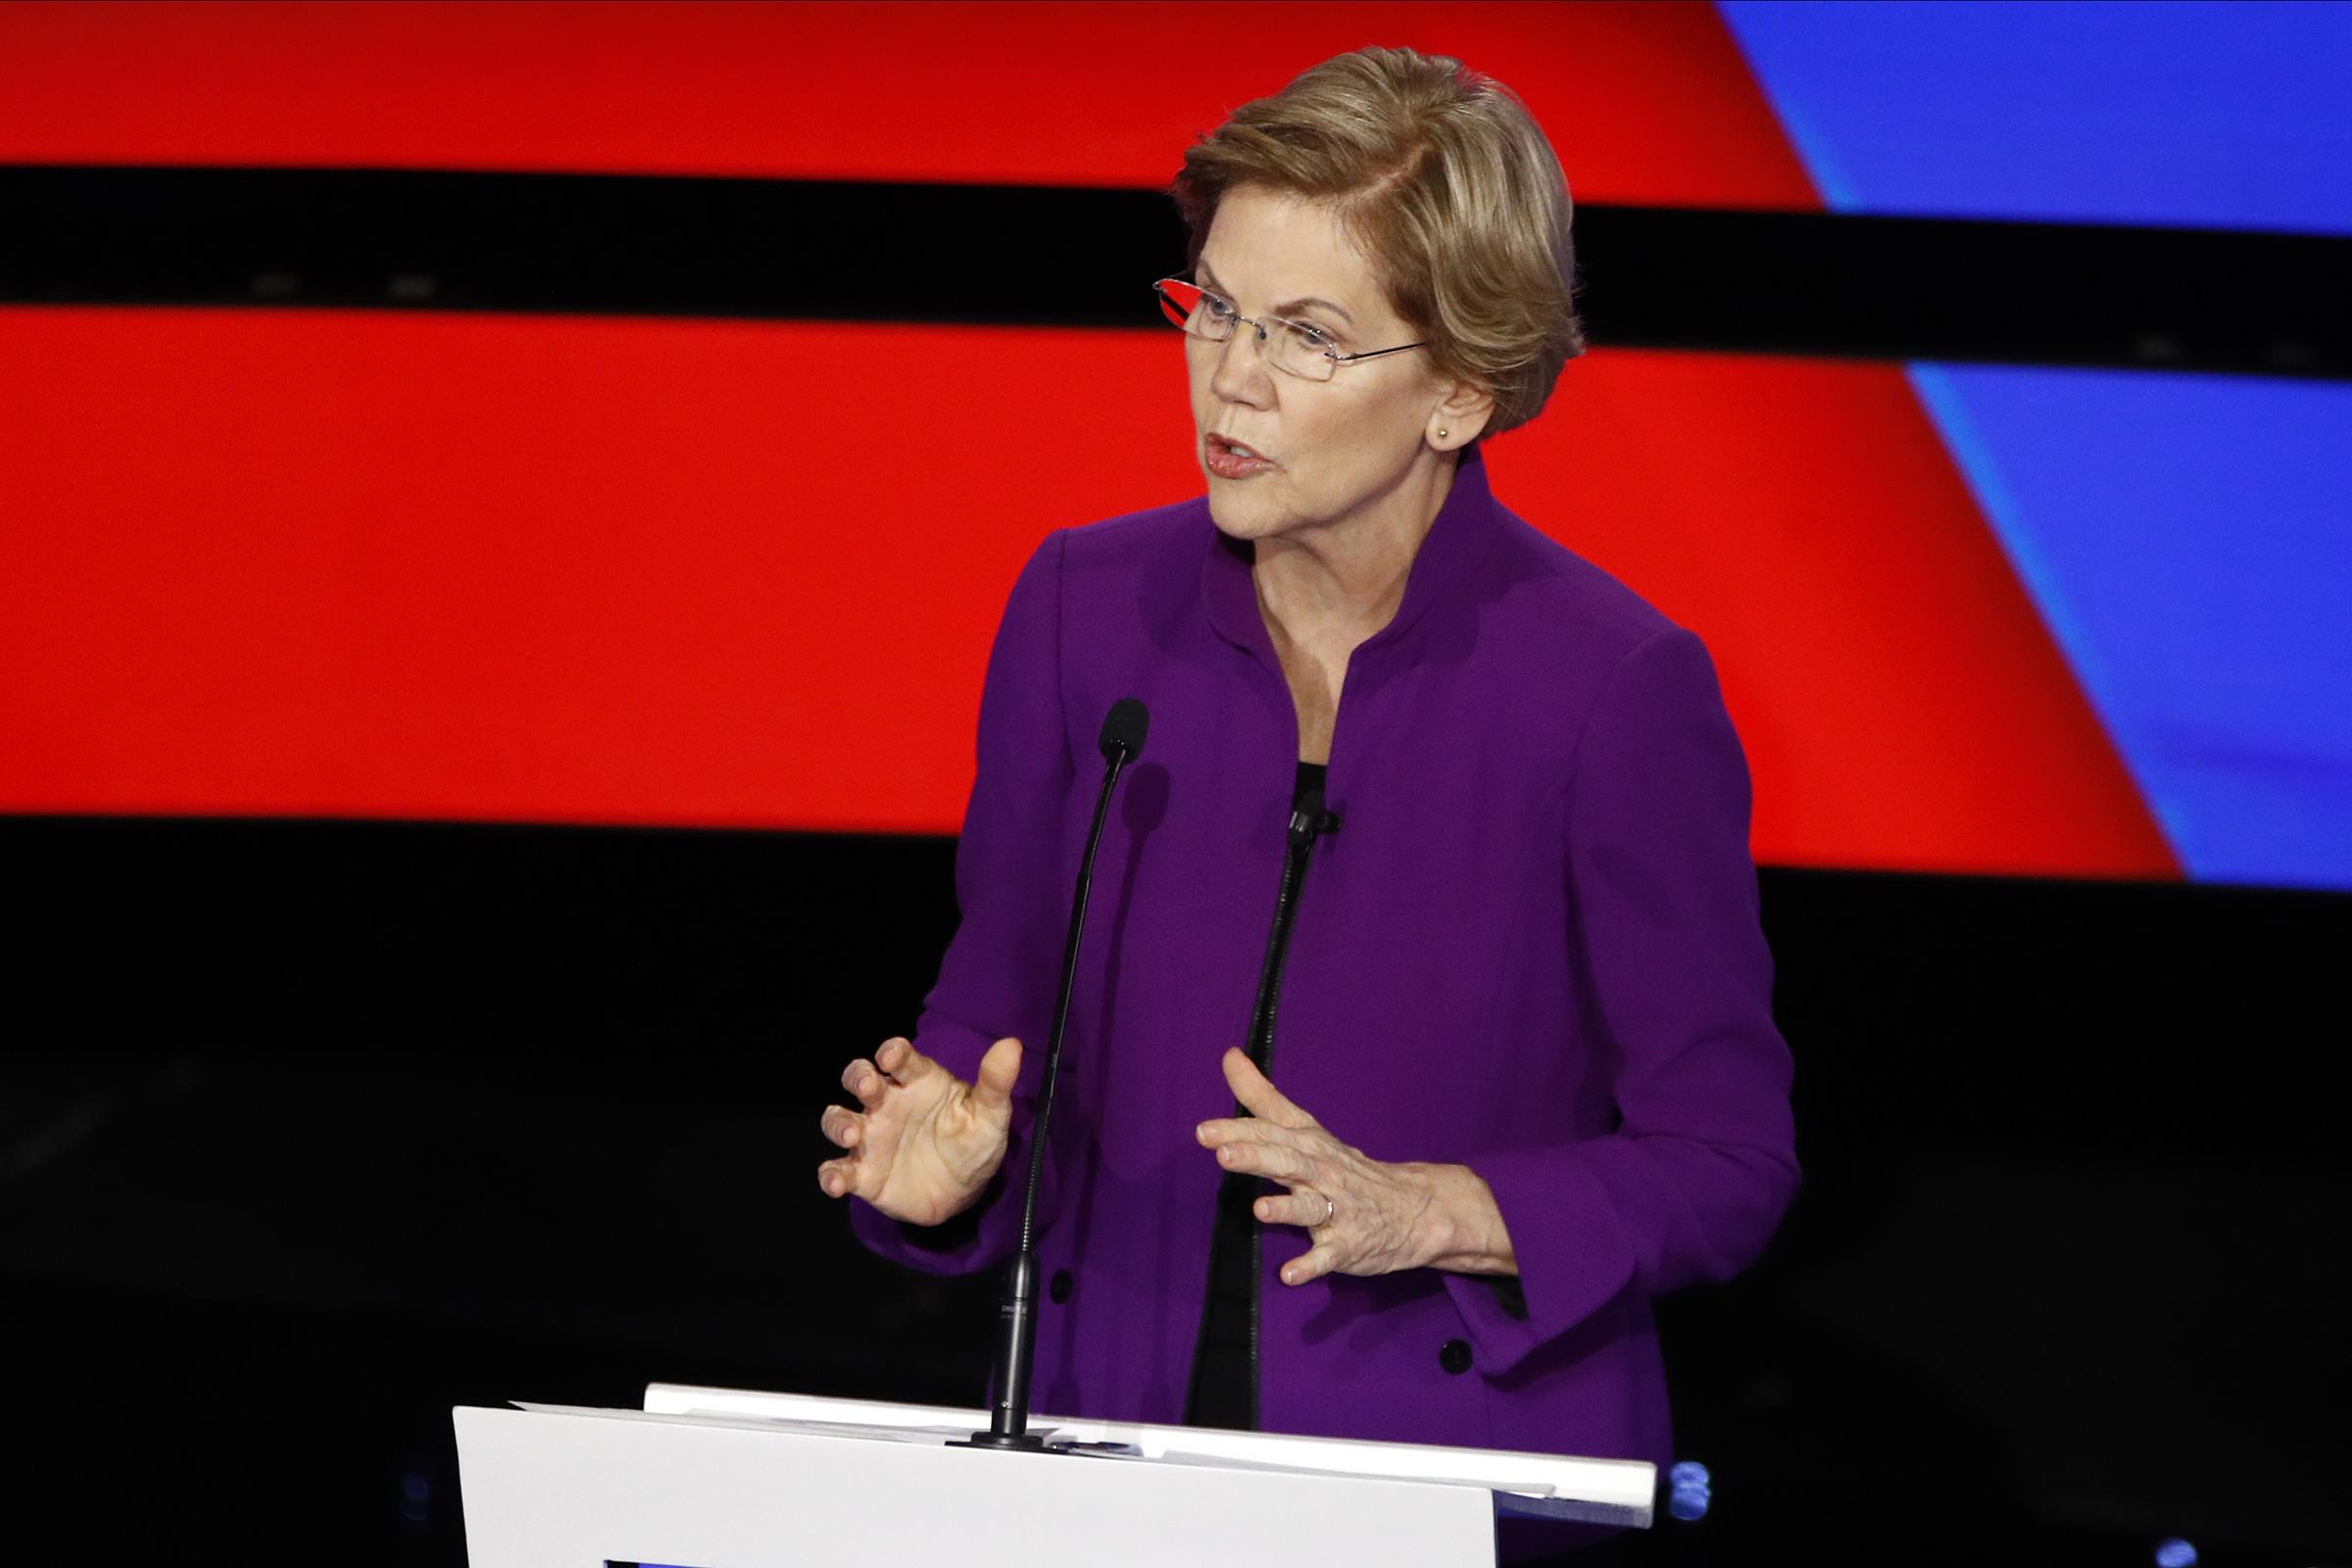 Democratic presidential candidate Sen. Elizabeth Warren, D-Mass., speaks during a Democratic presidential primary debate in Des Moines, Iowa on Jan. 14, 2020.